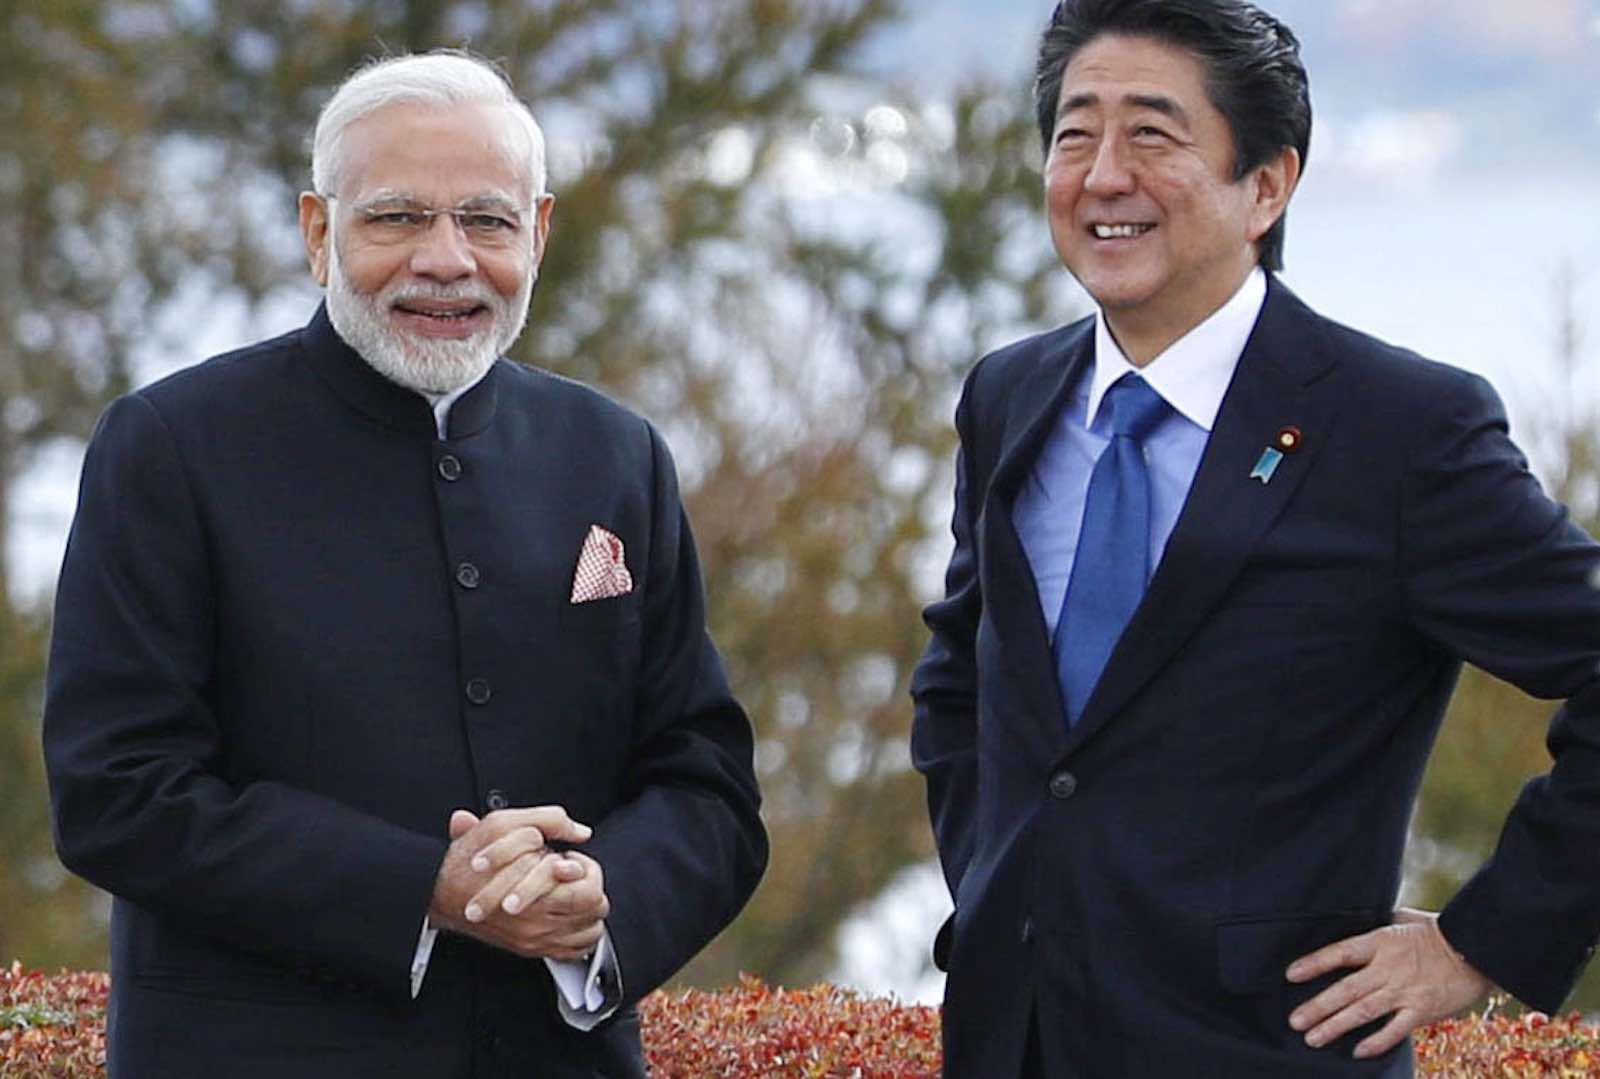 Forging a close and trustworthy relationship (Photo: Kyodo News via Getty)